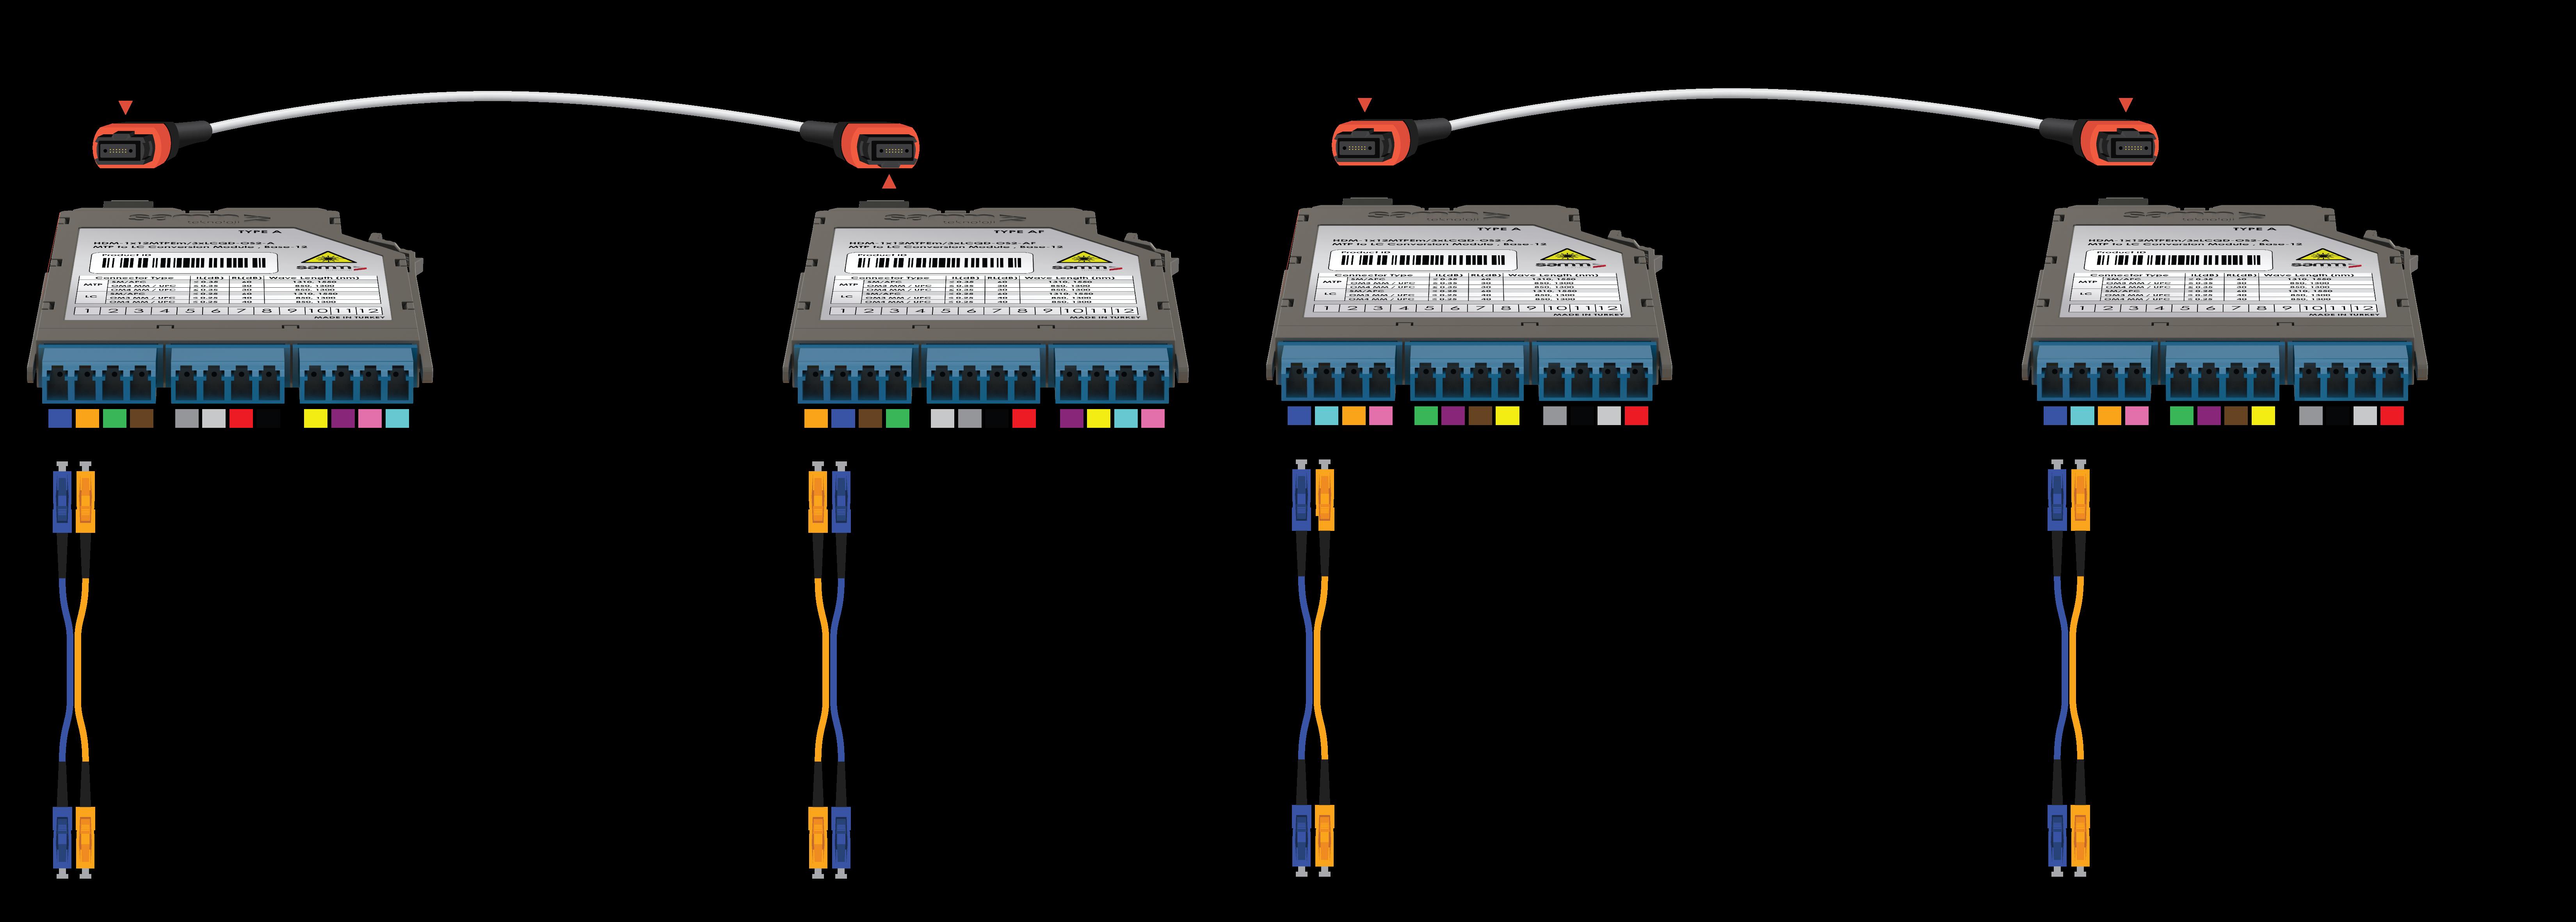 mpo-cassette-polarization-28.png (1.06 MB)